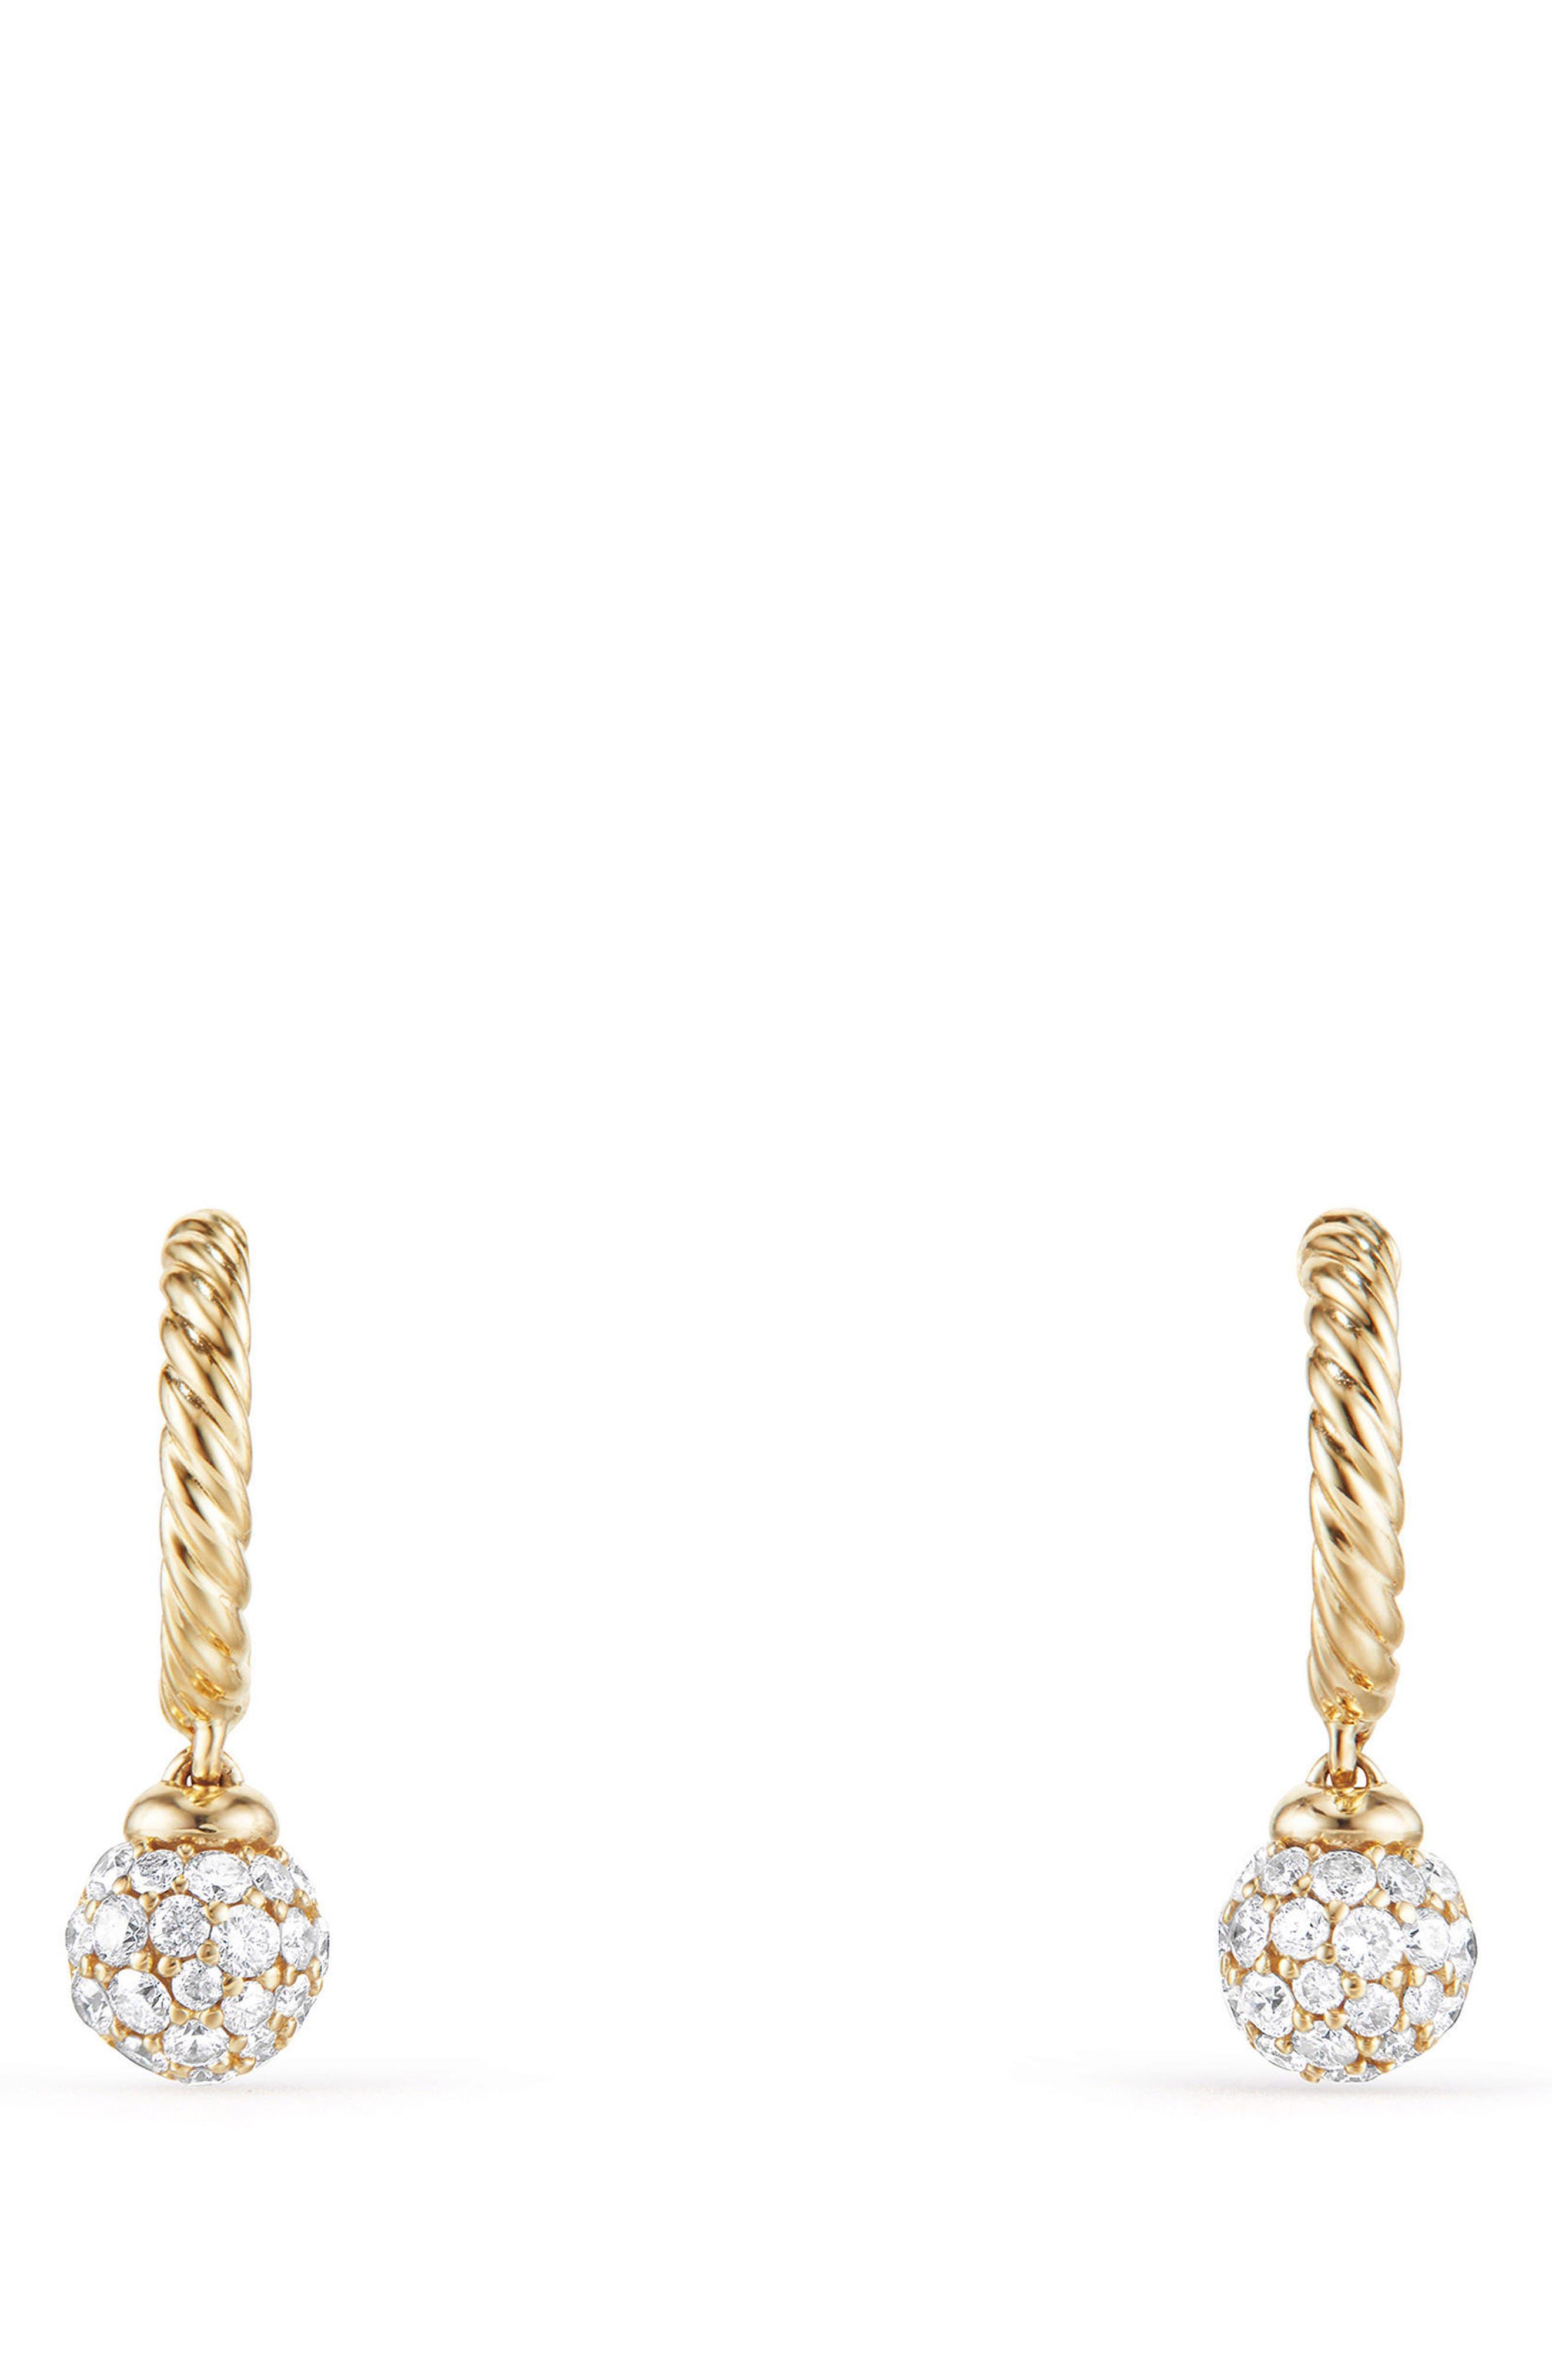 Petite Solari Hoop Pavé Earrings with Diamonds in 18K Gold,                             Alternate thumbnail 2, color,                             YELLOW GOLD/ DIAMOND